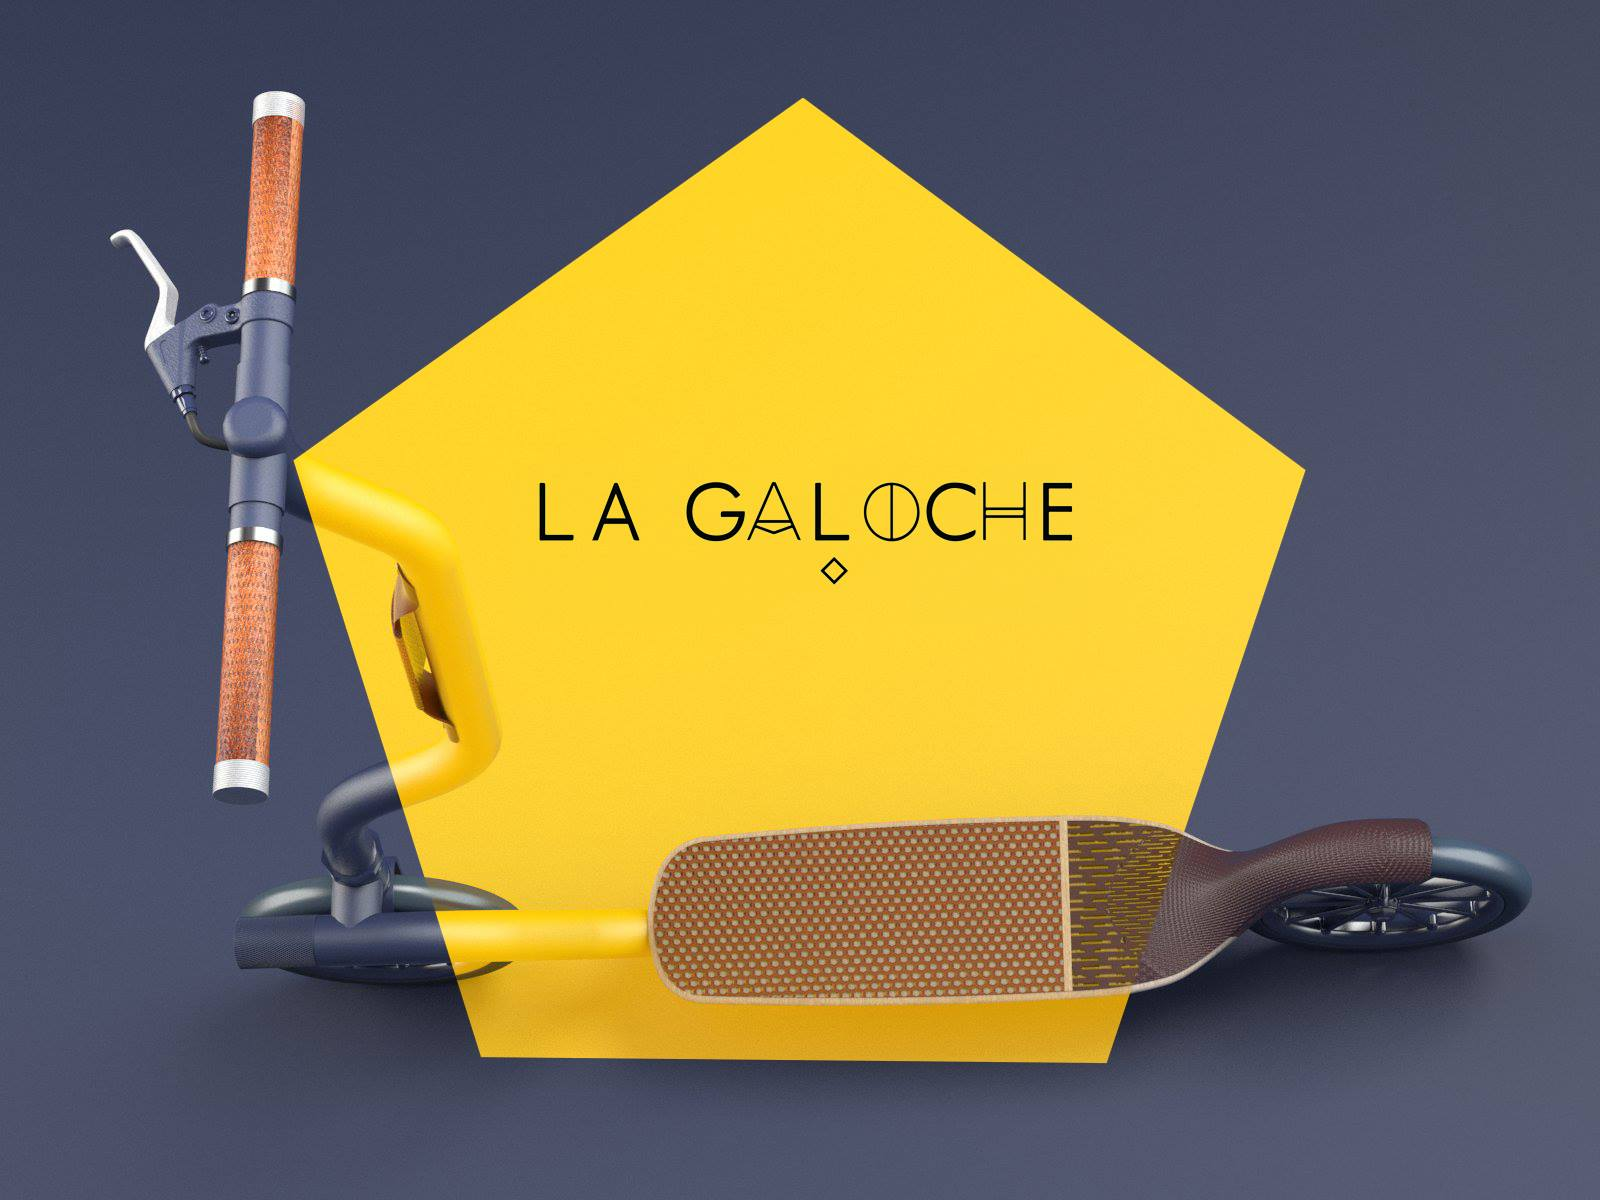 Самокат среды №81. La Galoche